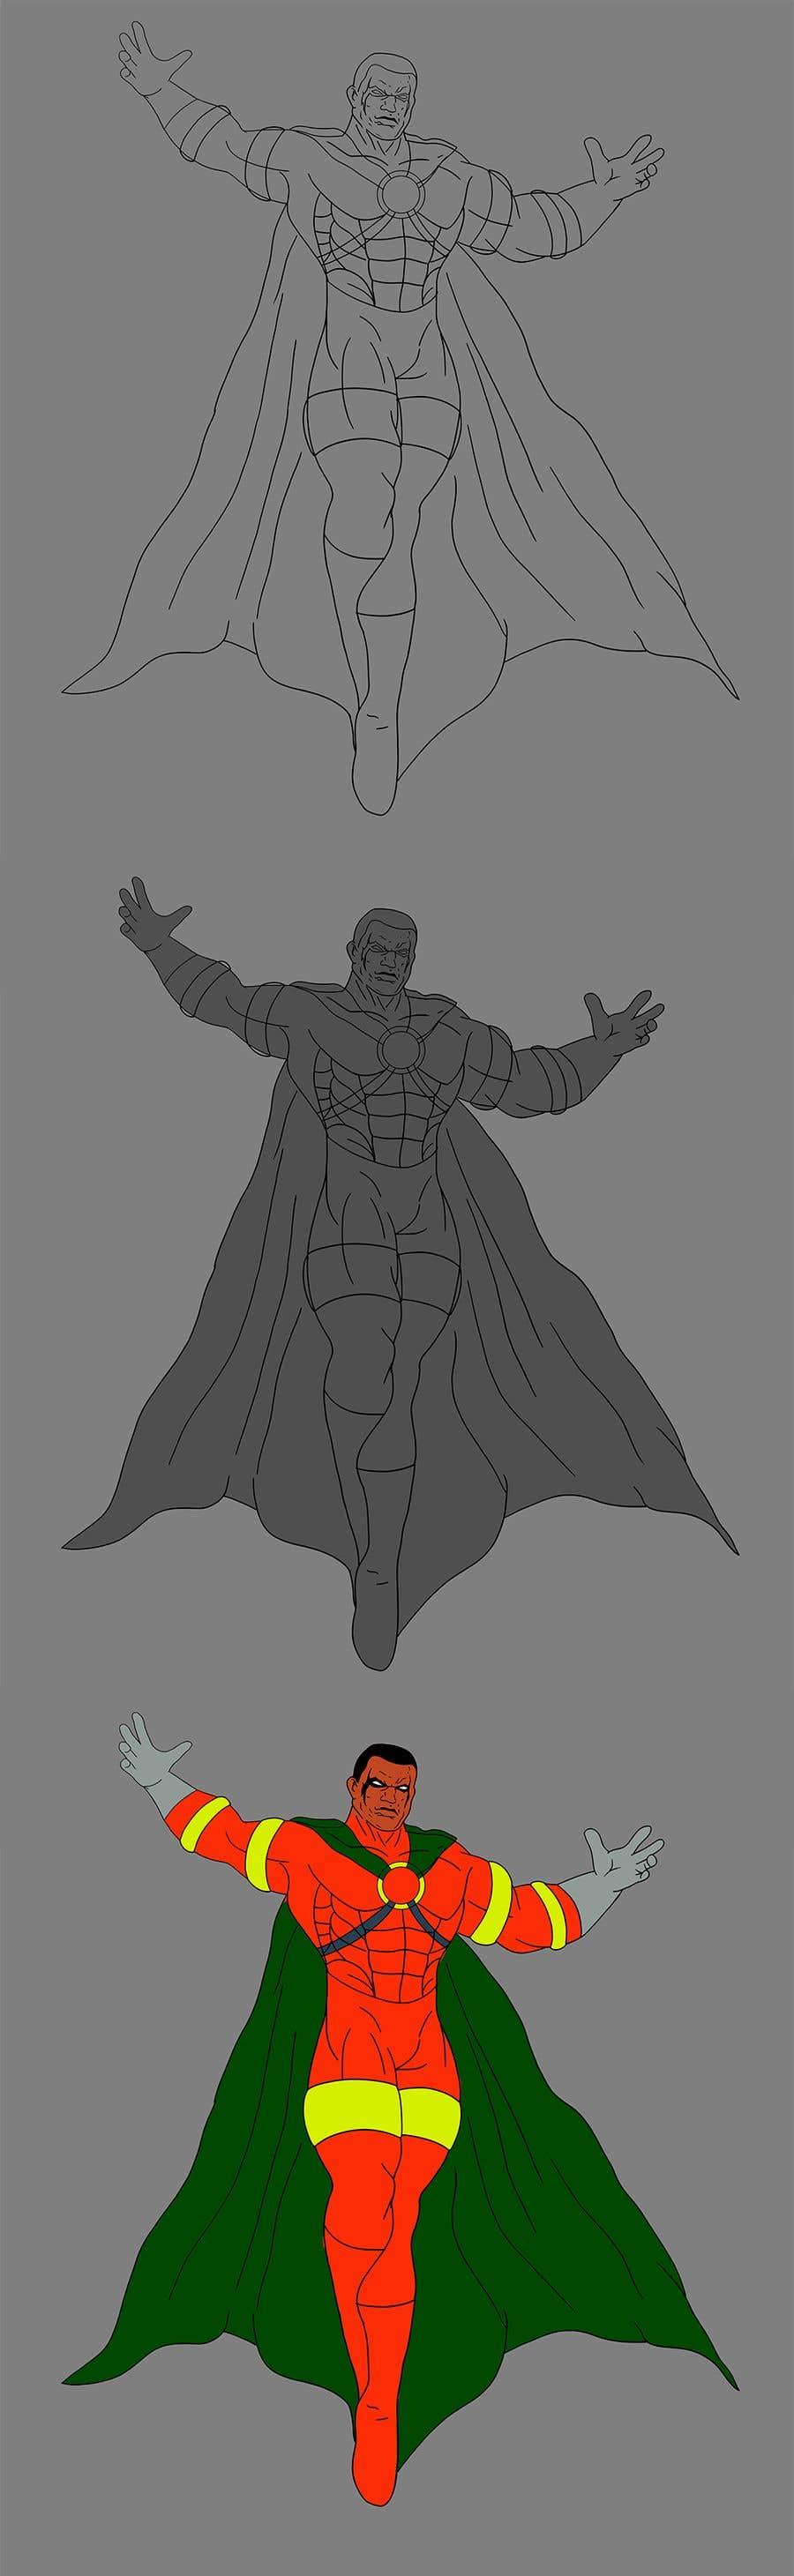 Konkurrenceindlæg #                                        20                                      for                                         Recreate 3 Superheroes - High Quality Photoshop or Illustrator Art